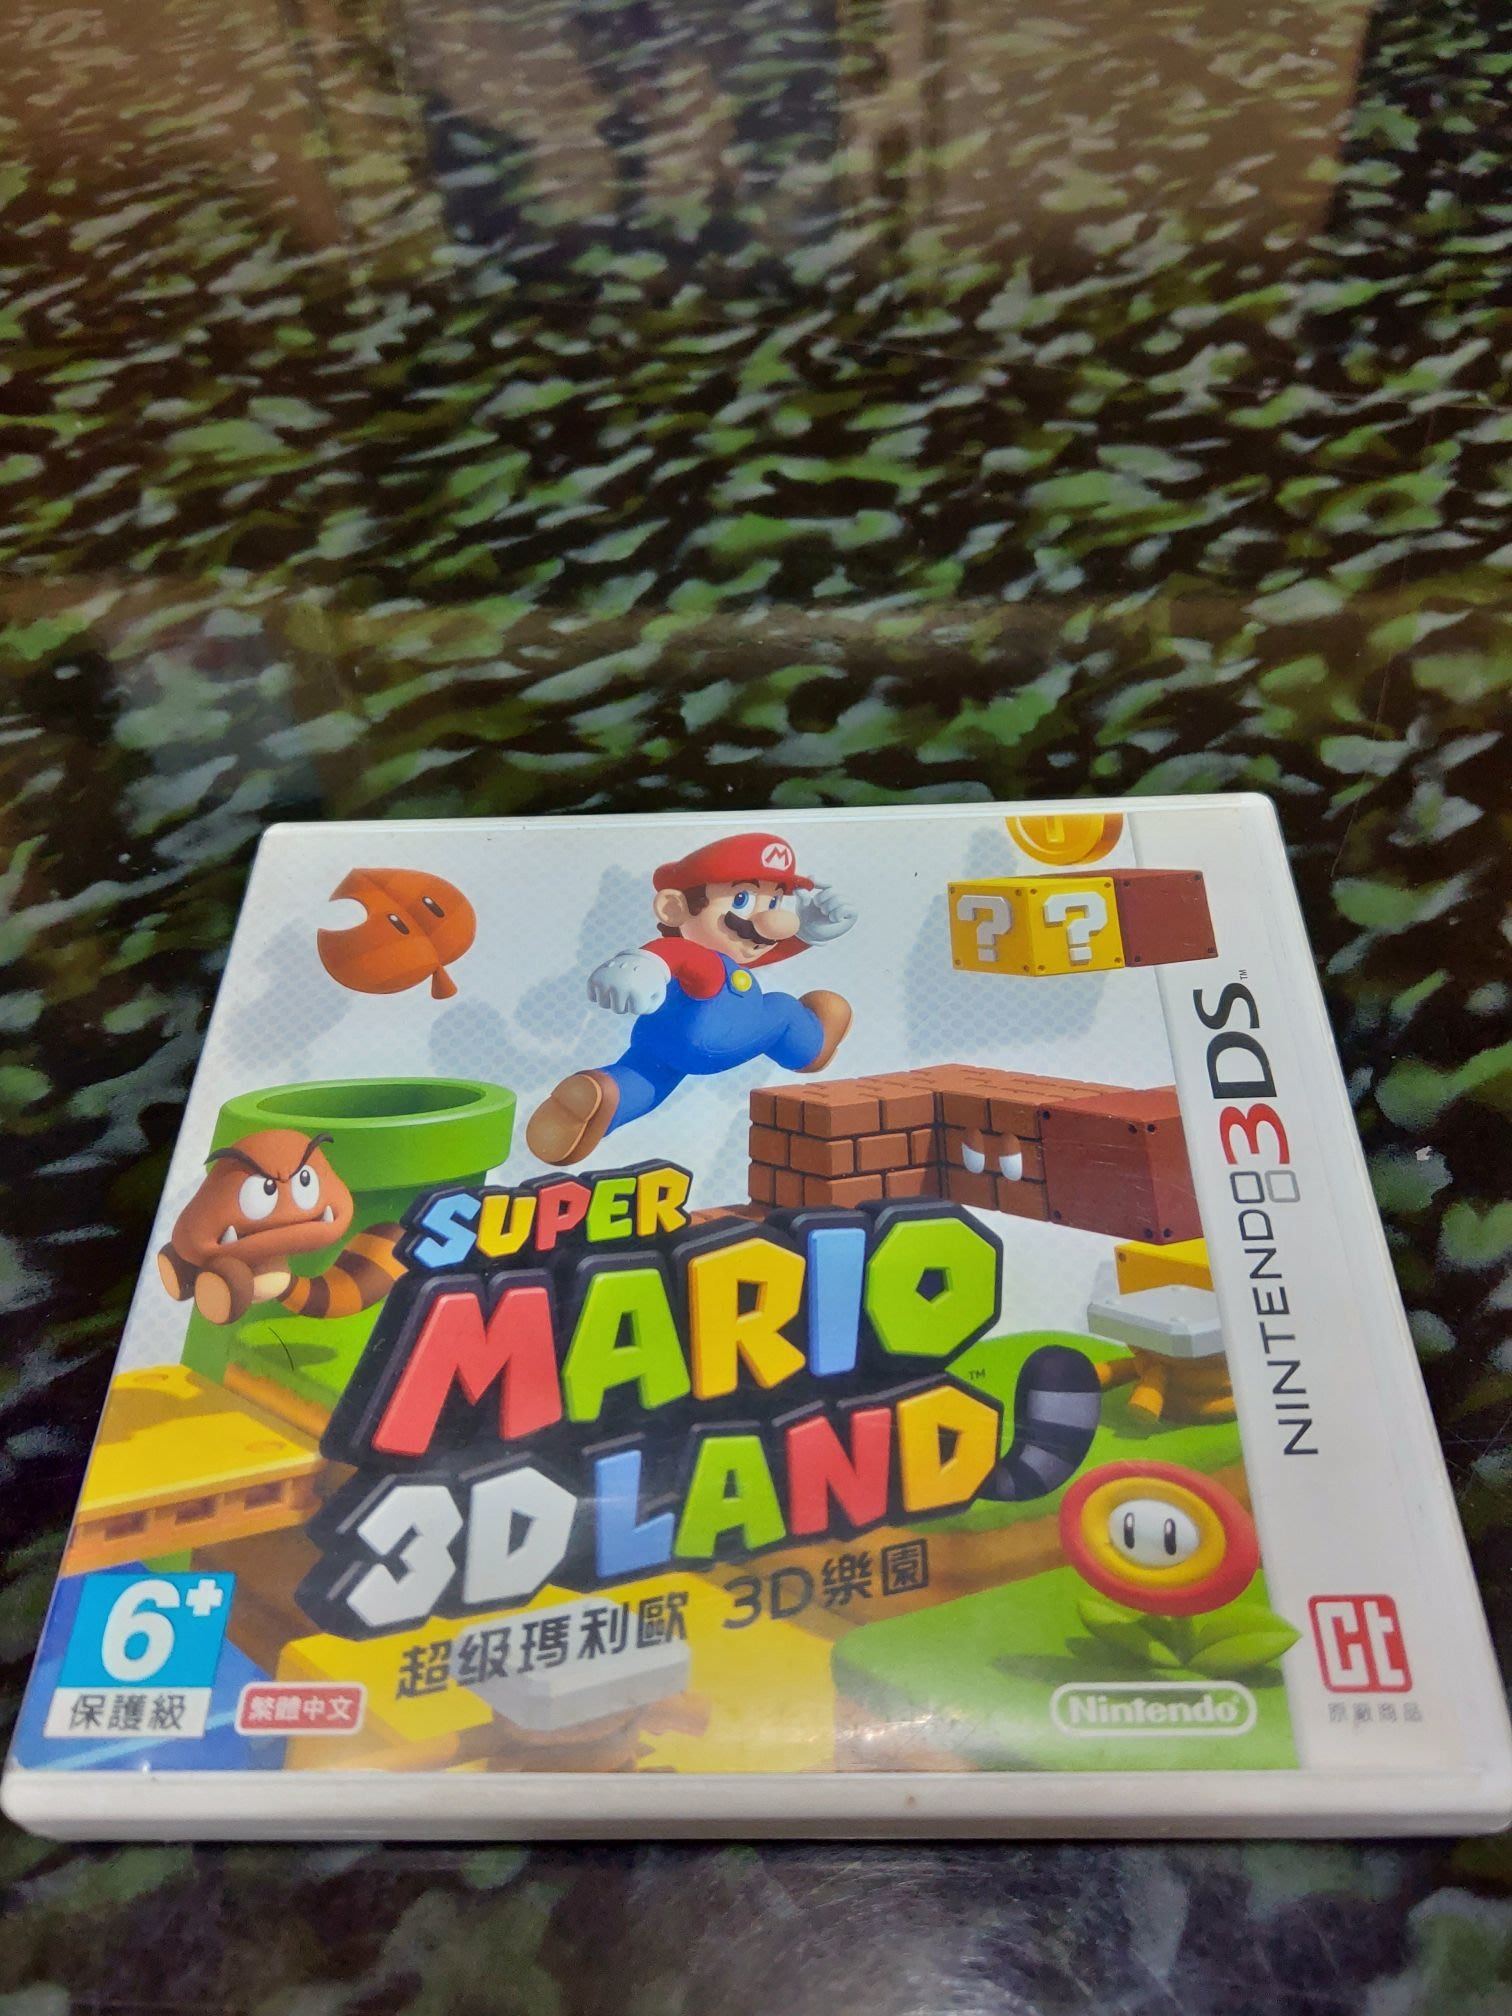 nintendo 任天堂 3DS遊戲片 【Super Mario 3D Land】二手品 日文版 CT原廠商品 台規機才能玩